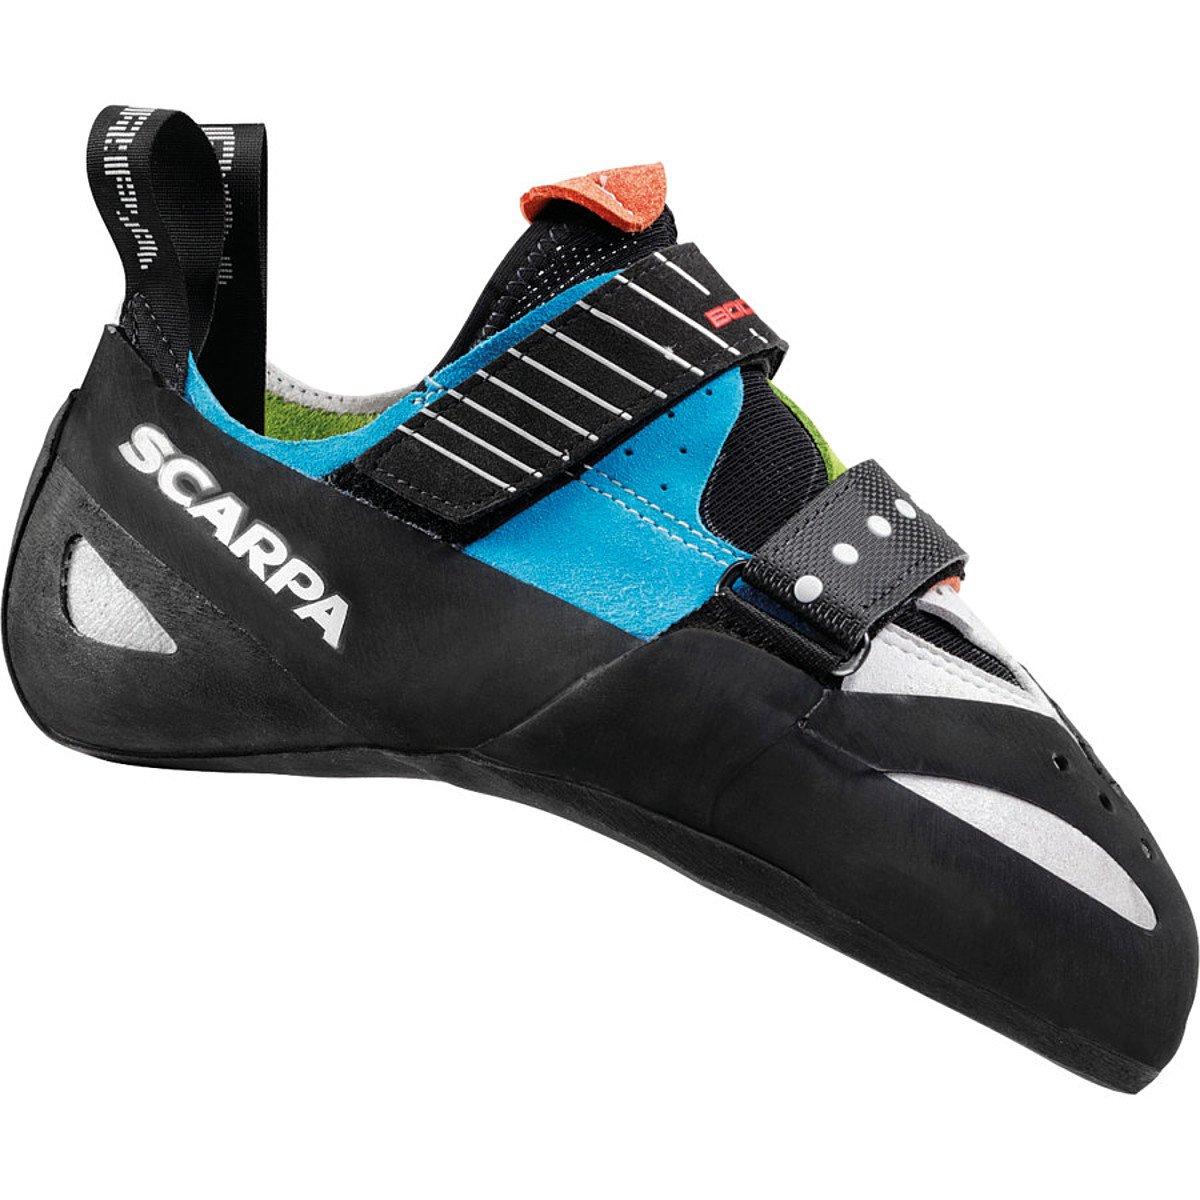 SCARPA Boostic Climbing Shoe B00EANMR0O 40.5 M EU|Parrot / Spring / Turquoise